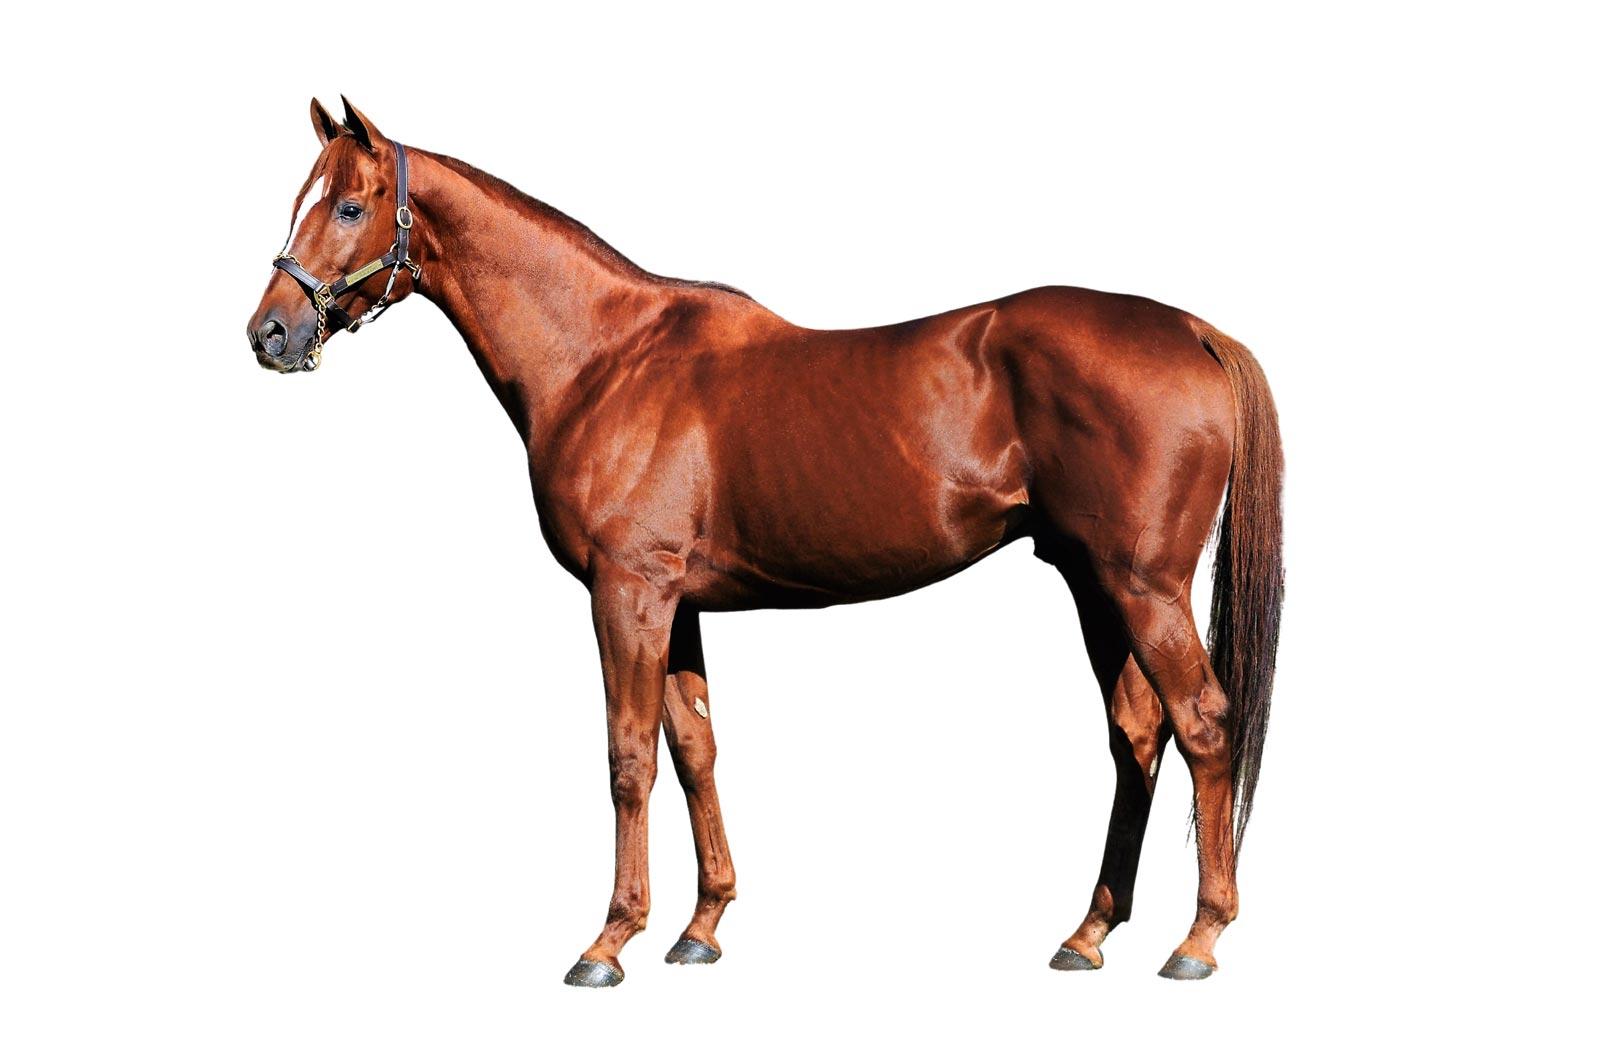 Lovacres Race horse Oscar Nominated